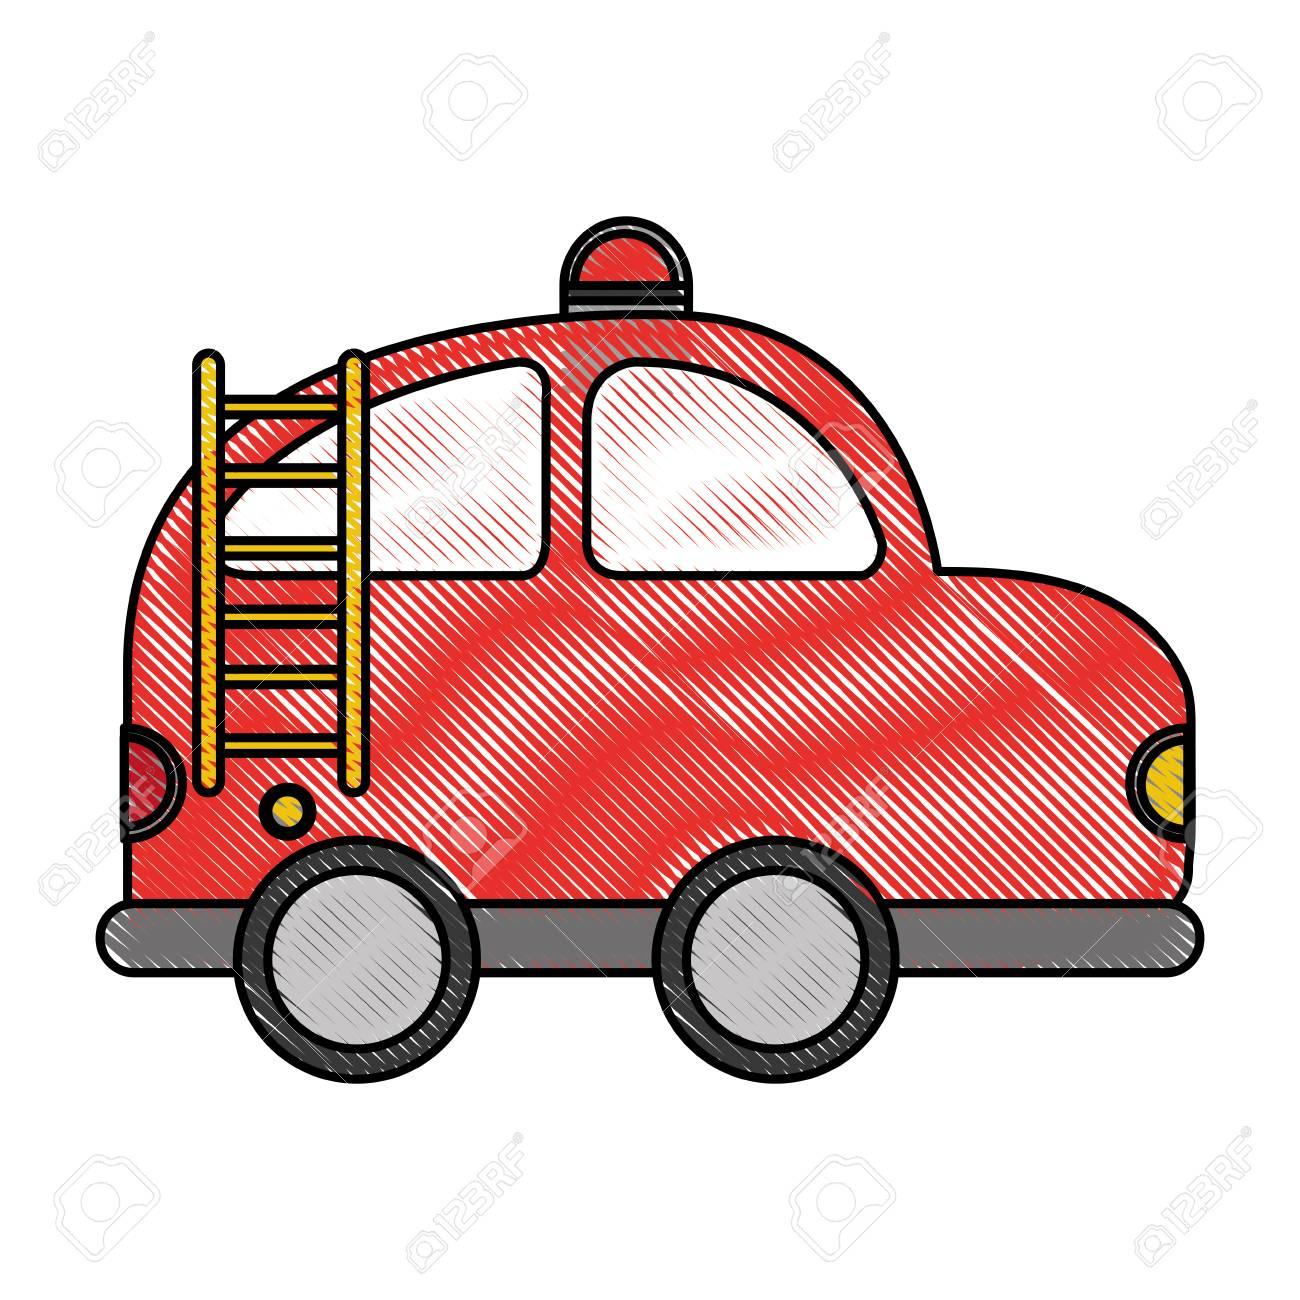 Voiture De Pompier Dessin Icone Vector Illustration Design Clip